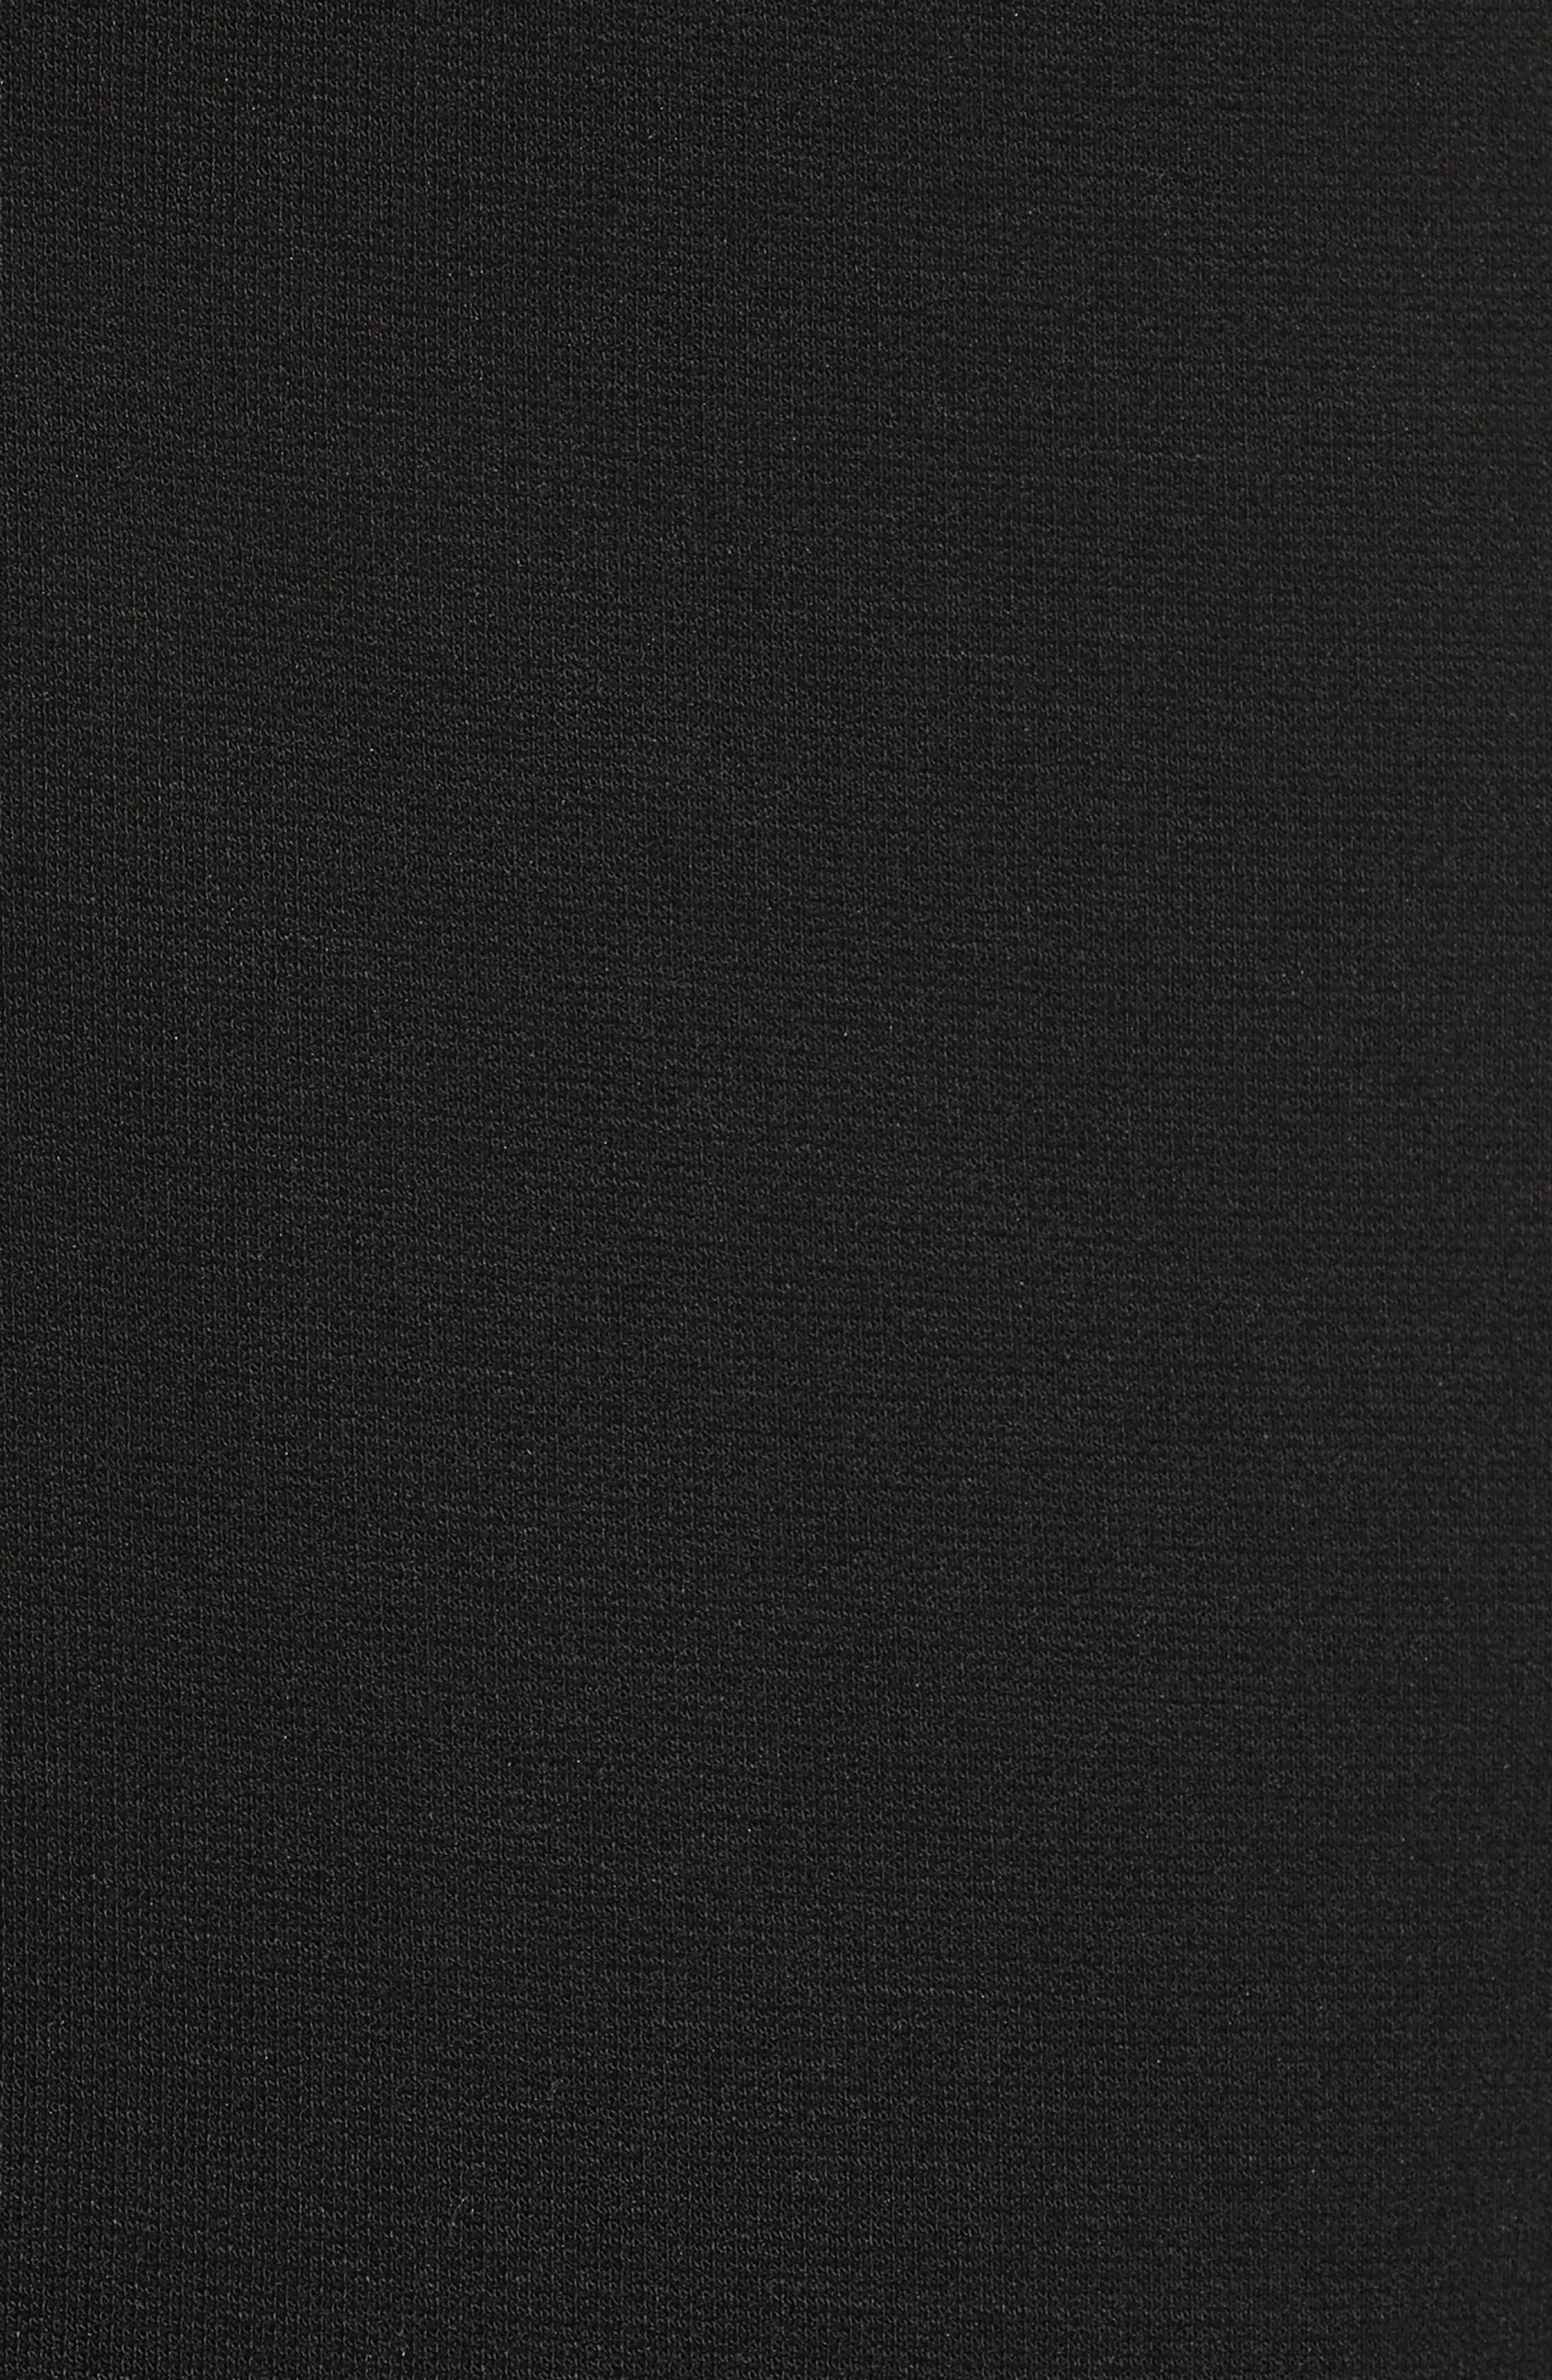 Rhinestone Halter Dress,                             Alternate thumbnail 6, color,                             Nero/ Rosa/ Oro